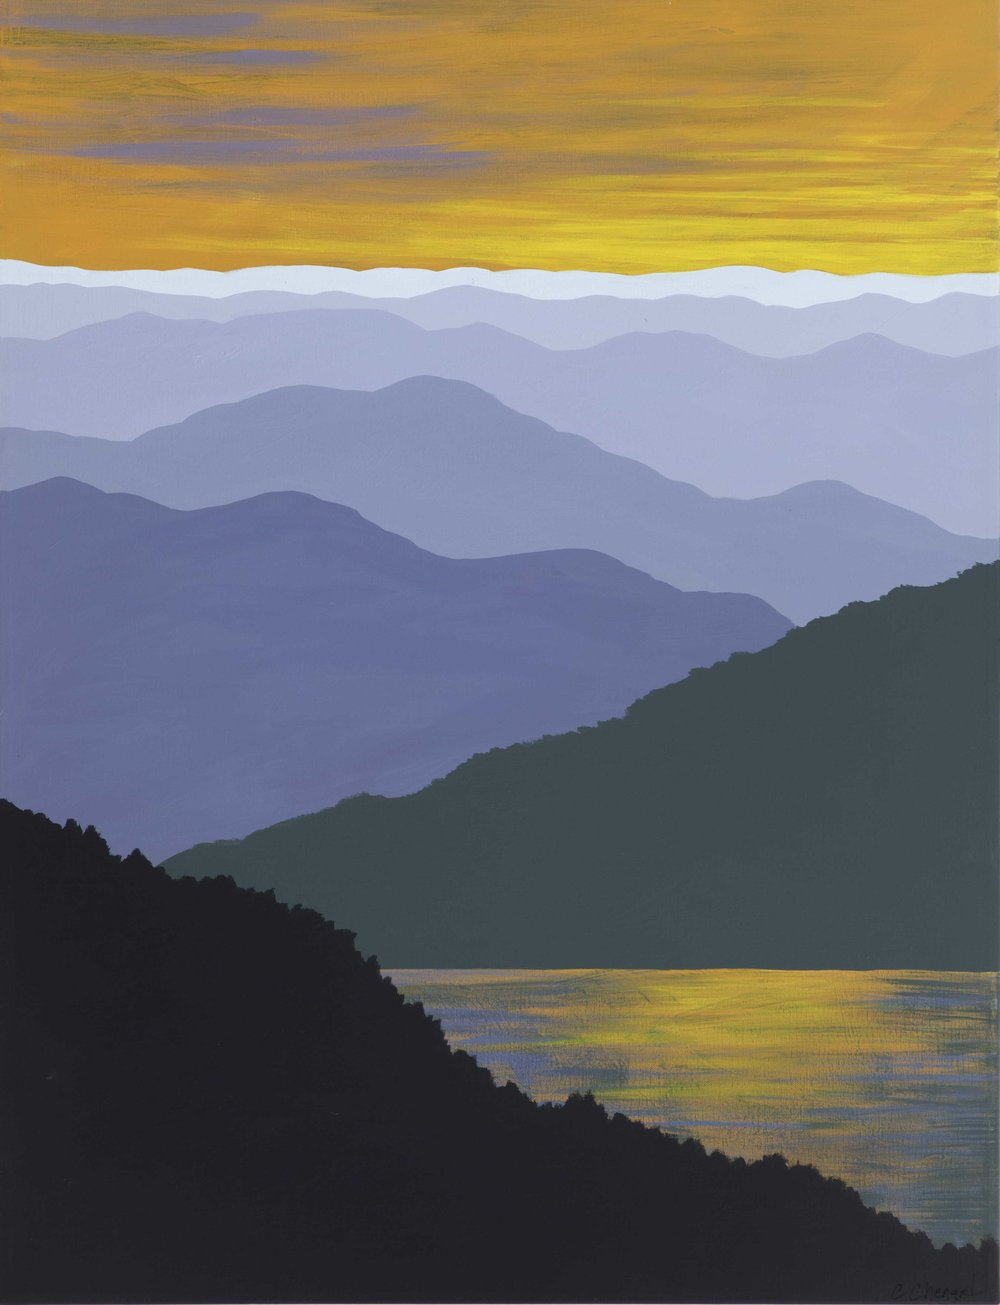 """SUNSET LAKE"",  Acrylic on Canvas,  30x40 inches,  $1200."